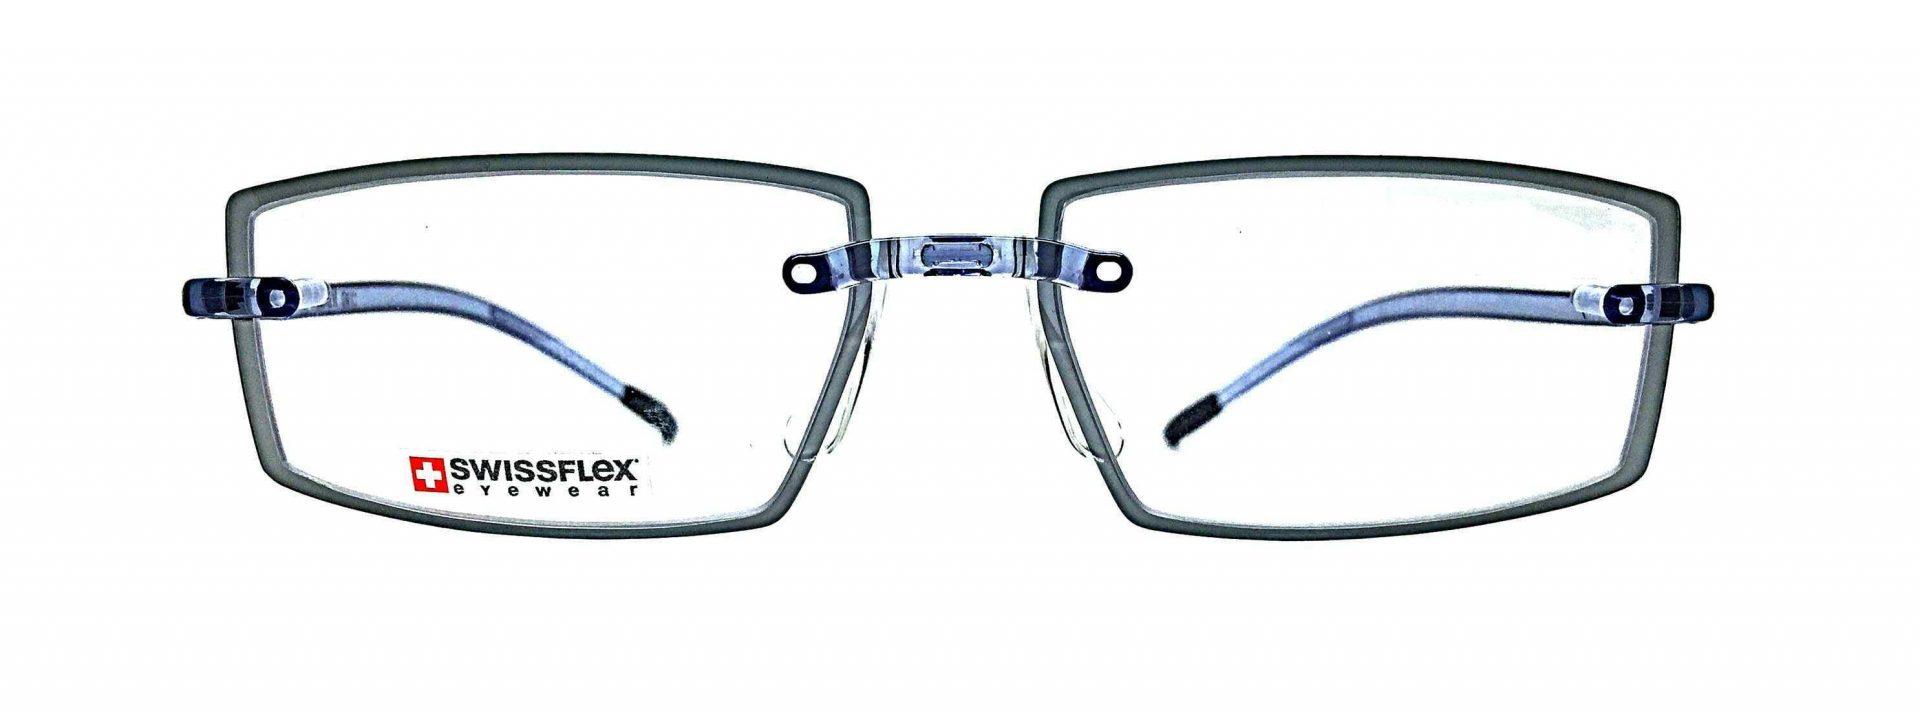 SwissFlex spectacles: SwissFlex Contur 103 54 1 2970x1100